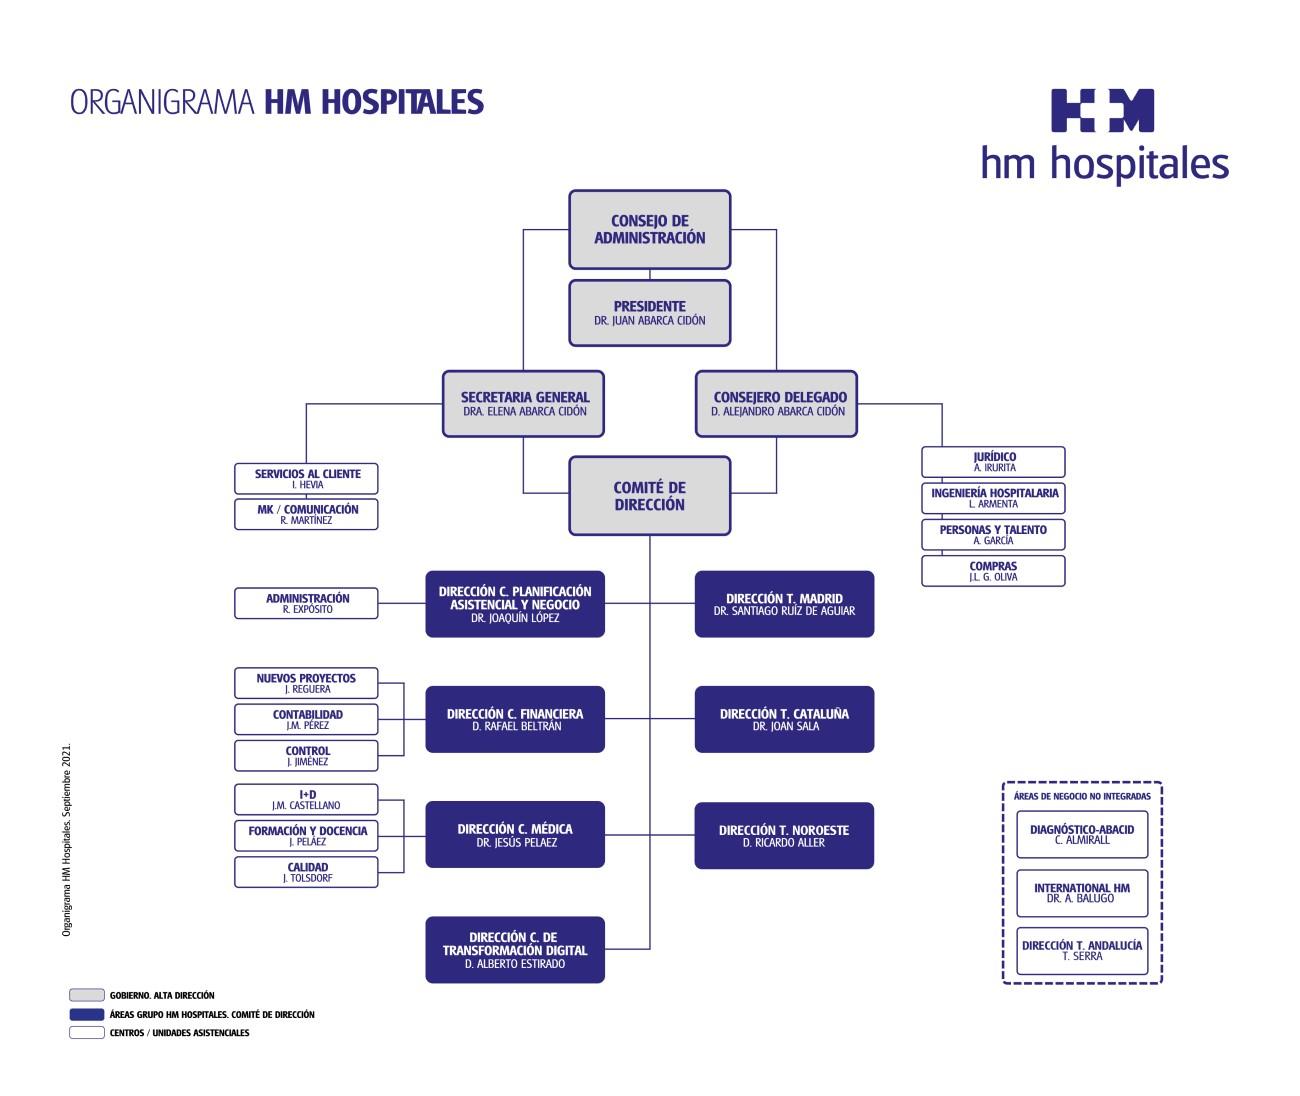 organigrama HM Hospitales